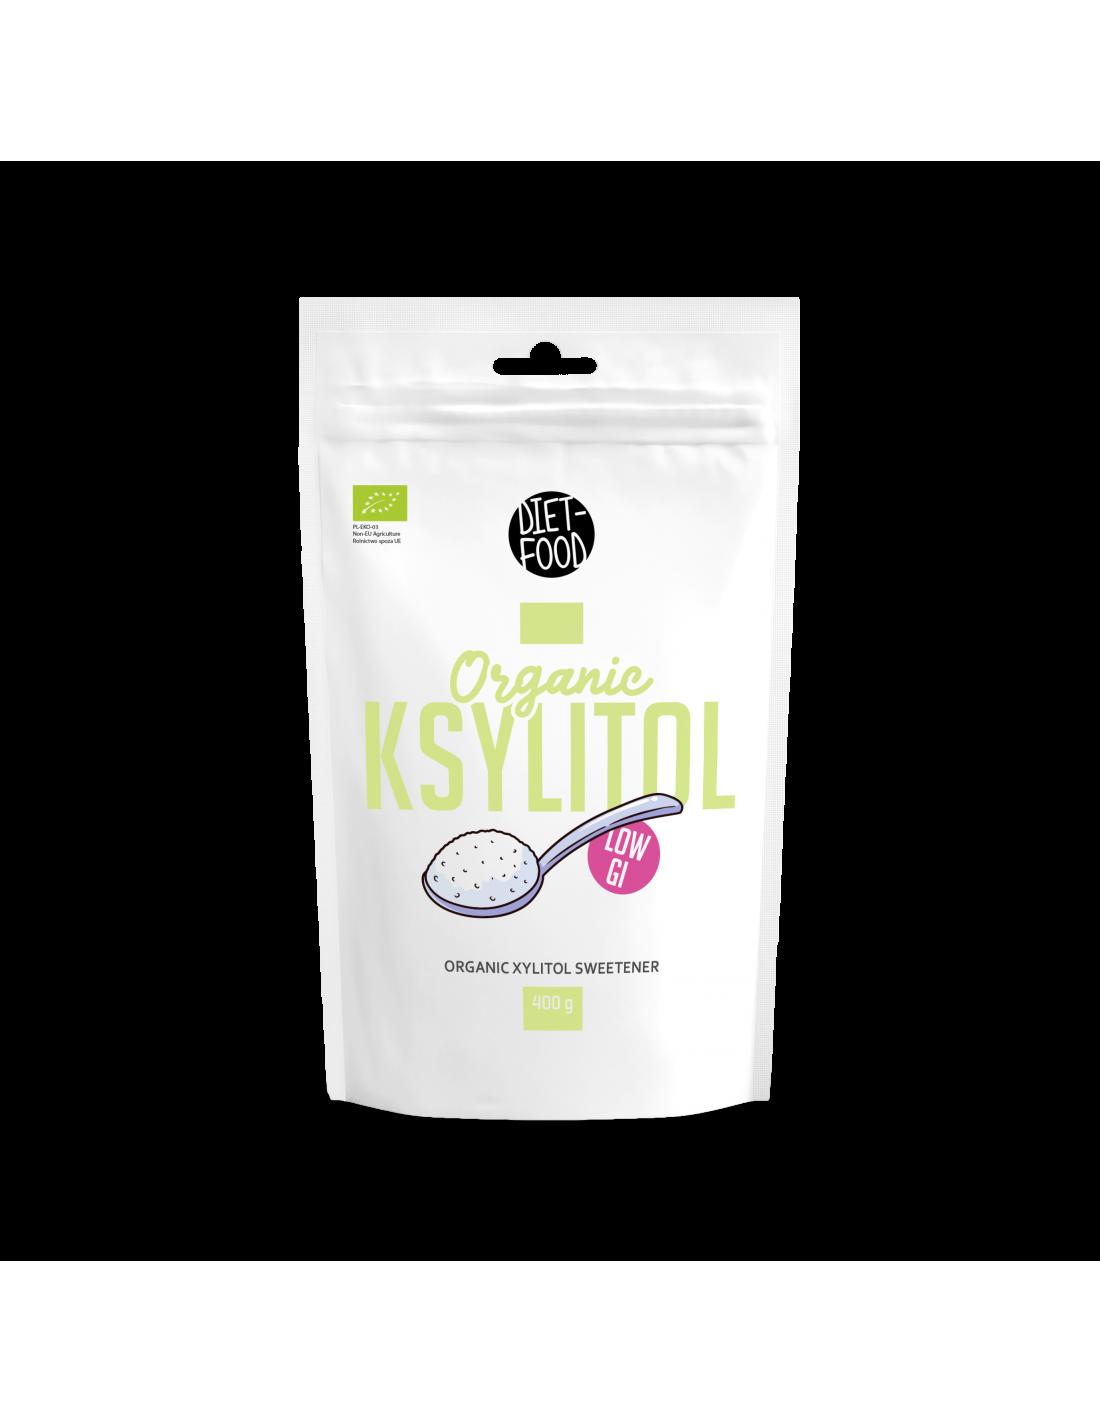 DIETFOOD - ORGANIC KSYLITOL 400g